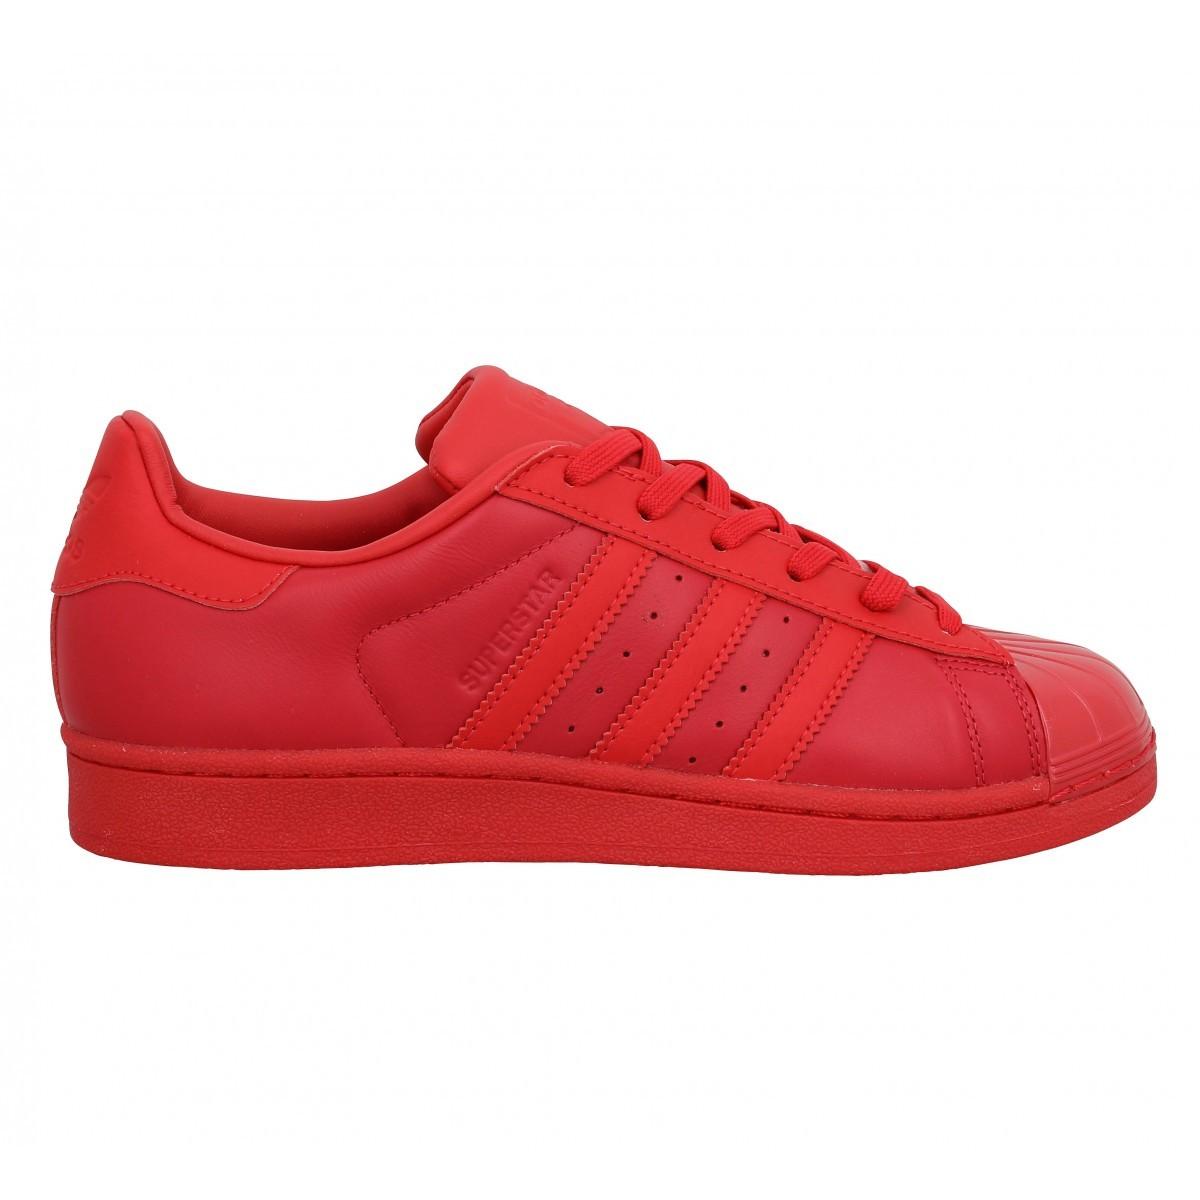 adidas superstar velour rouge